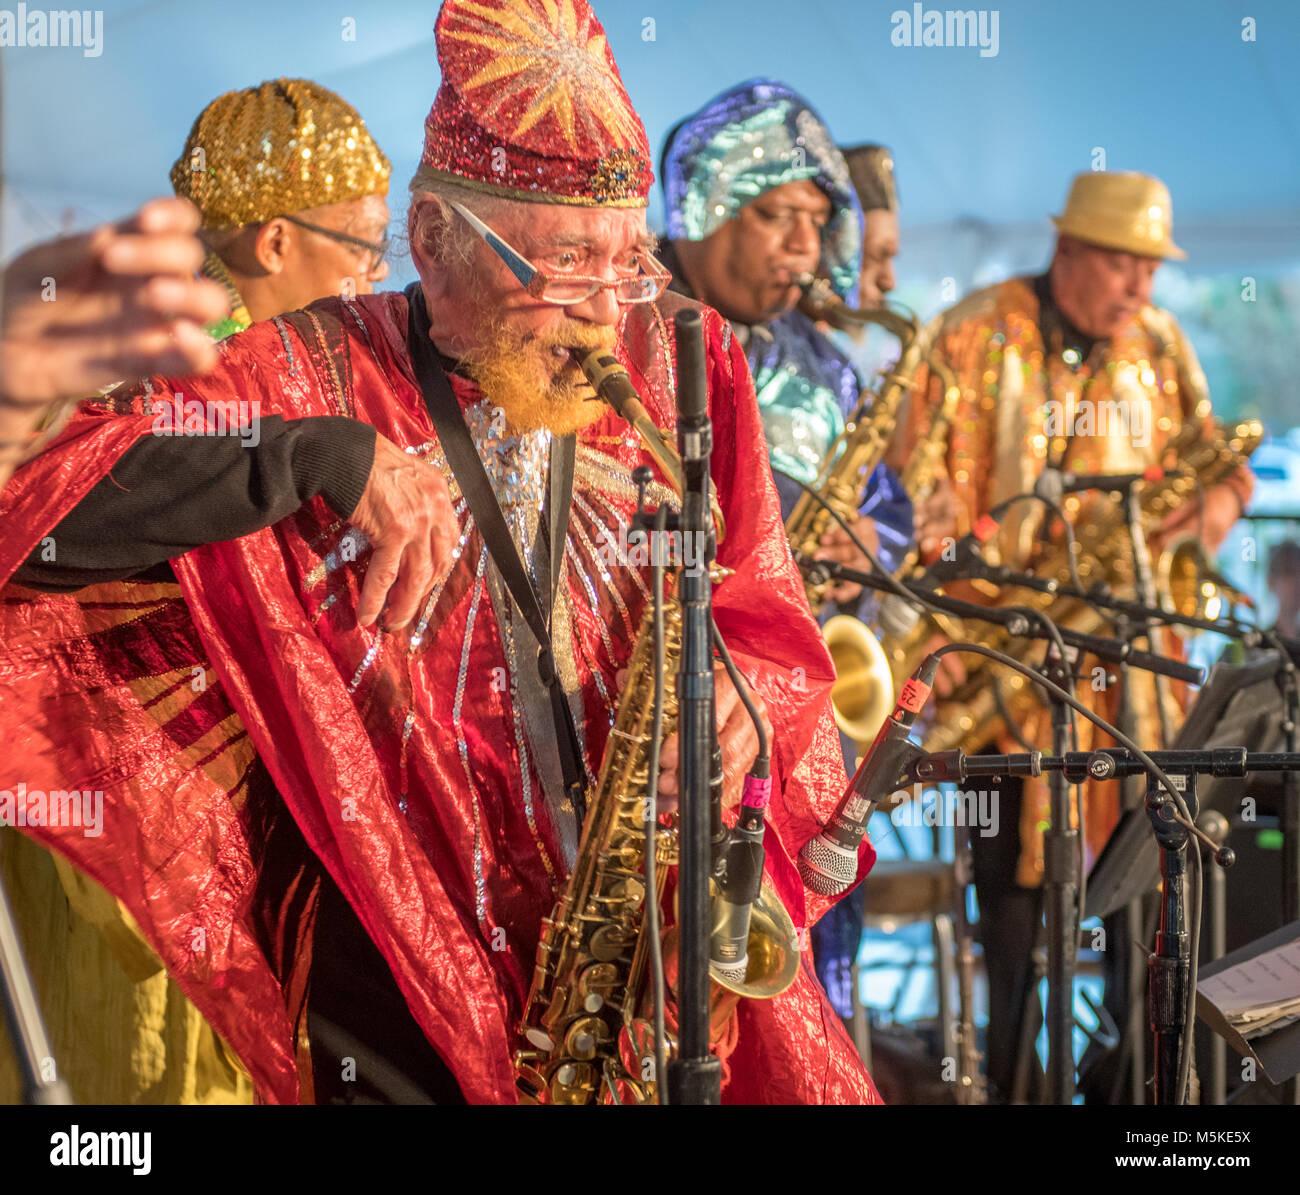 National  Folk Festival in Greensboro NC -  Sun Ra Arkestra free jazz   Marshall Allen  Greensboro, North Carolina. - Stock Image